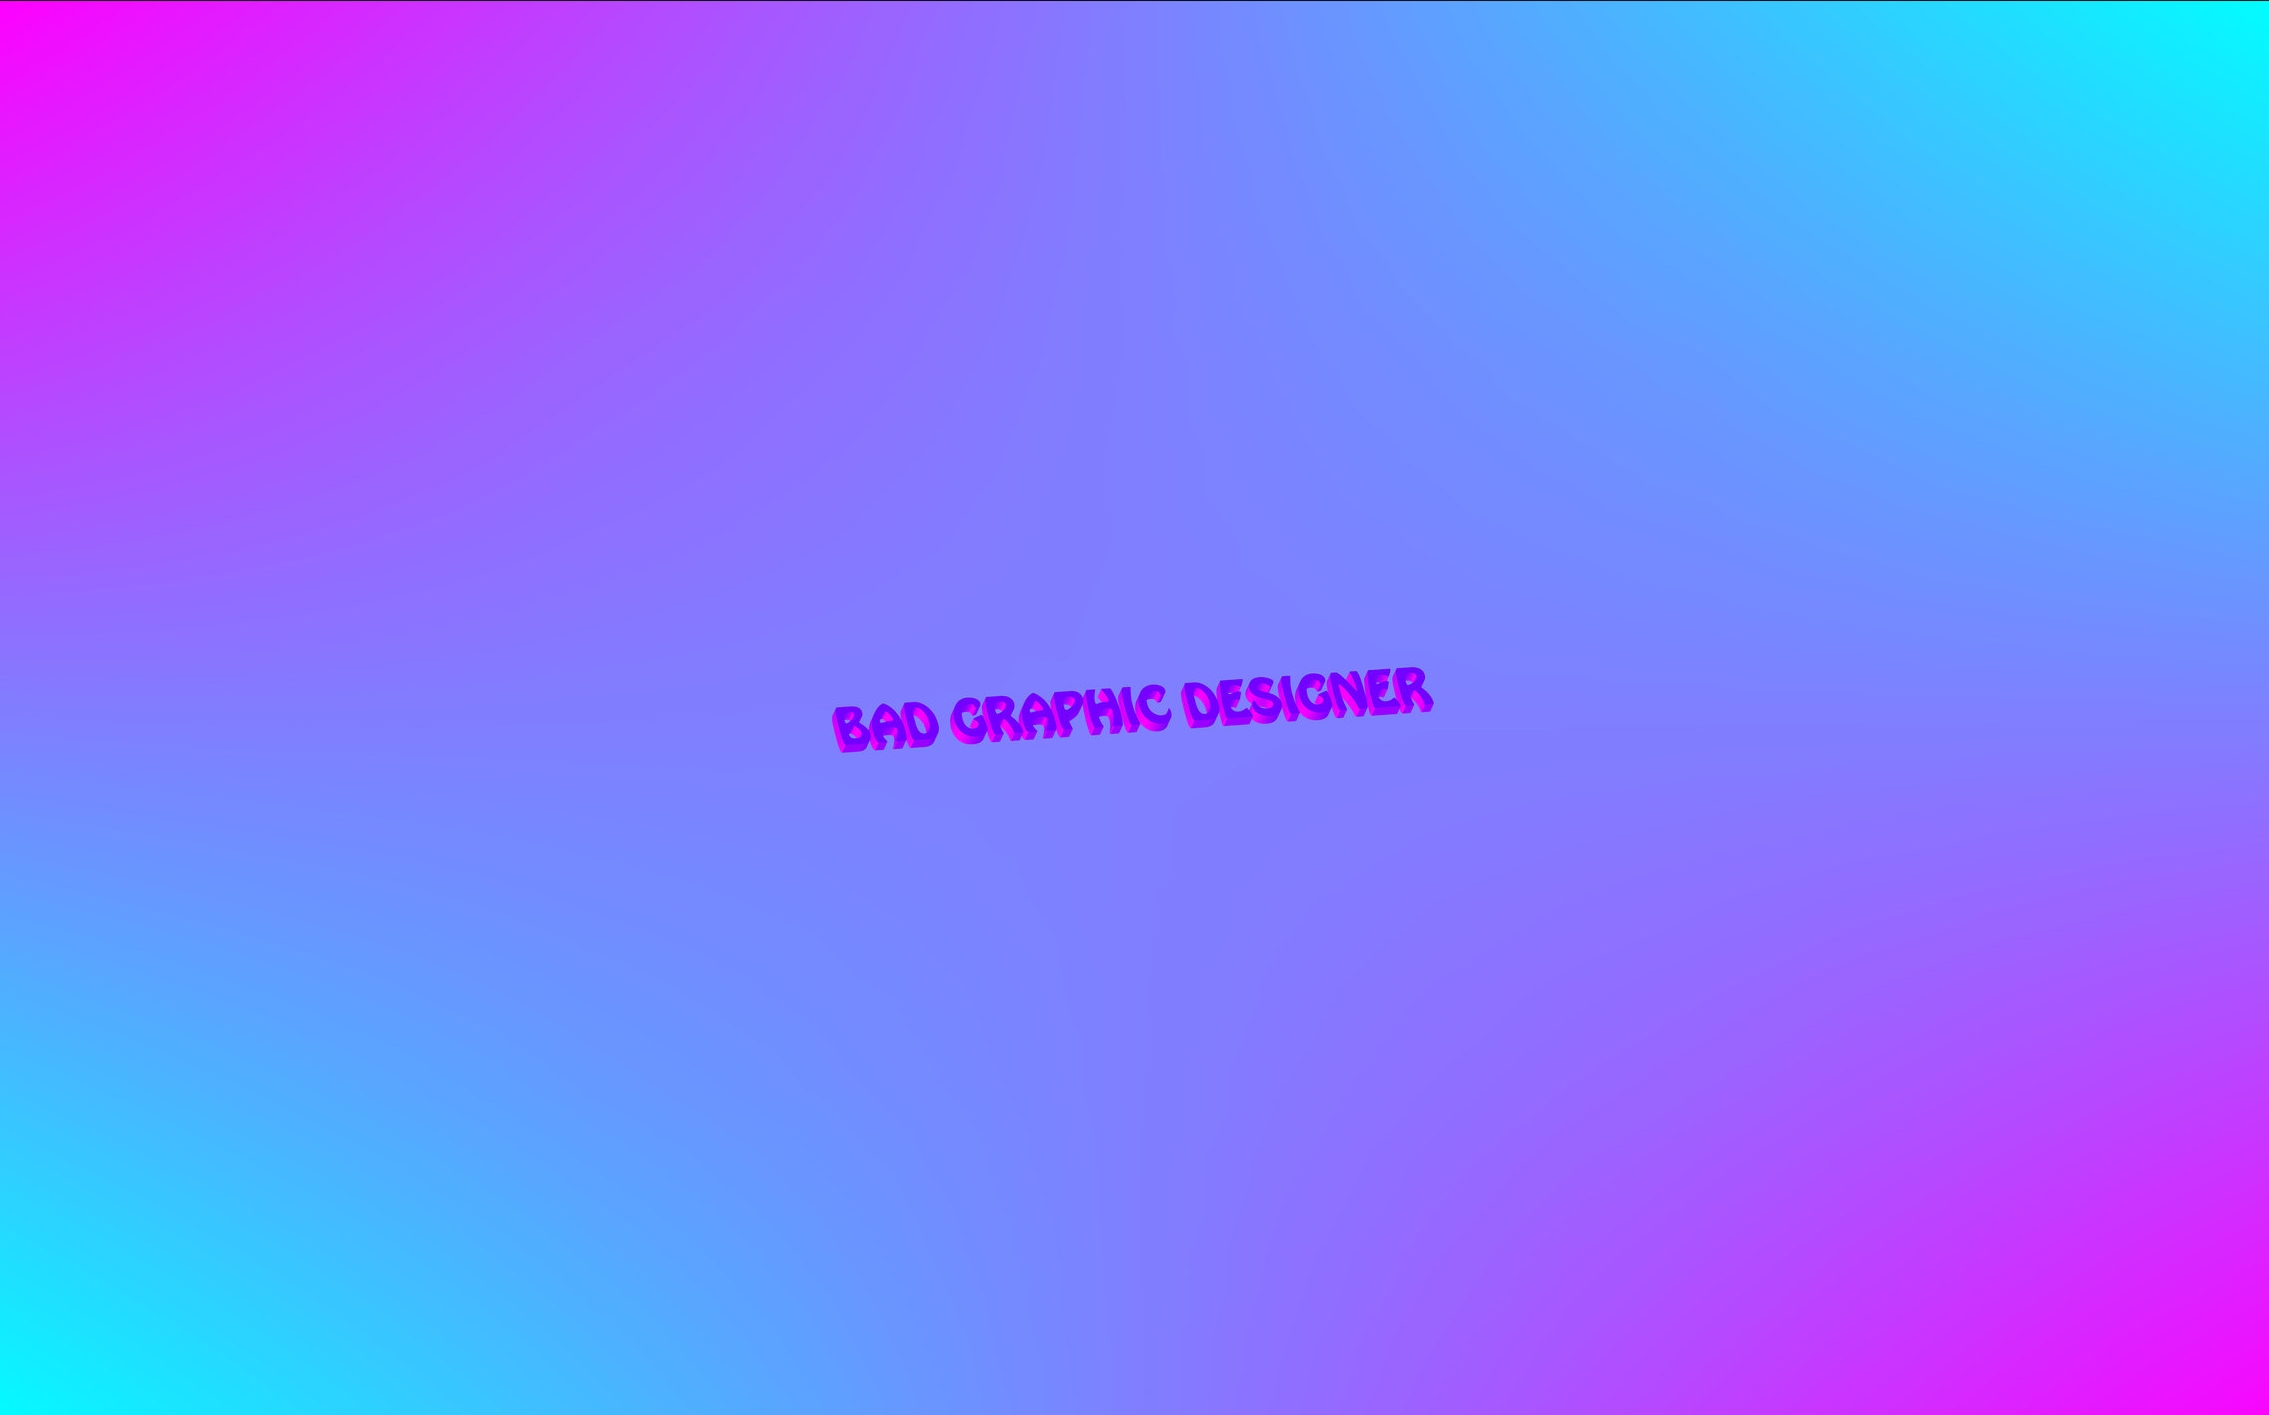 Bad-graphic-designer.jpg